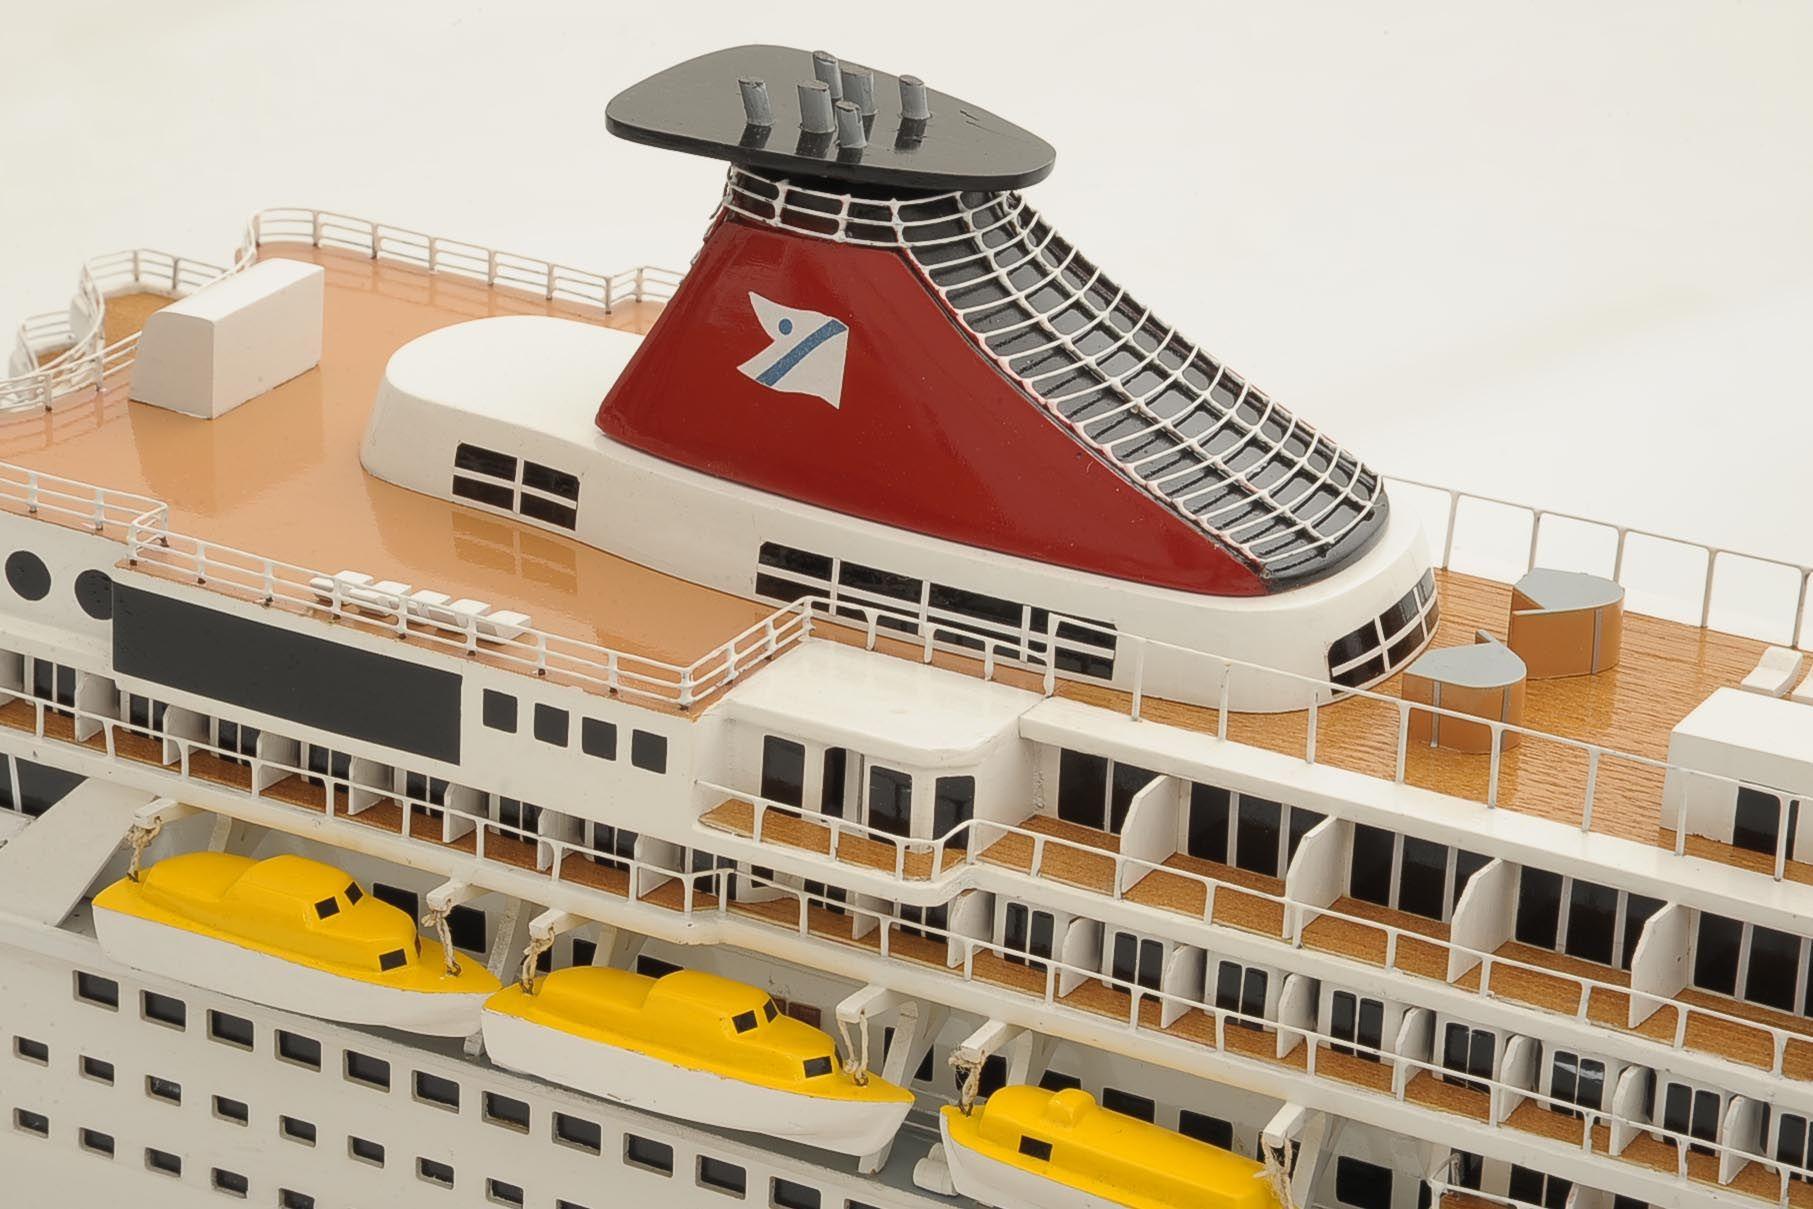 1292-6414-Balmoral-Cruise-Liner